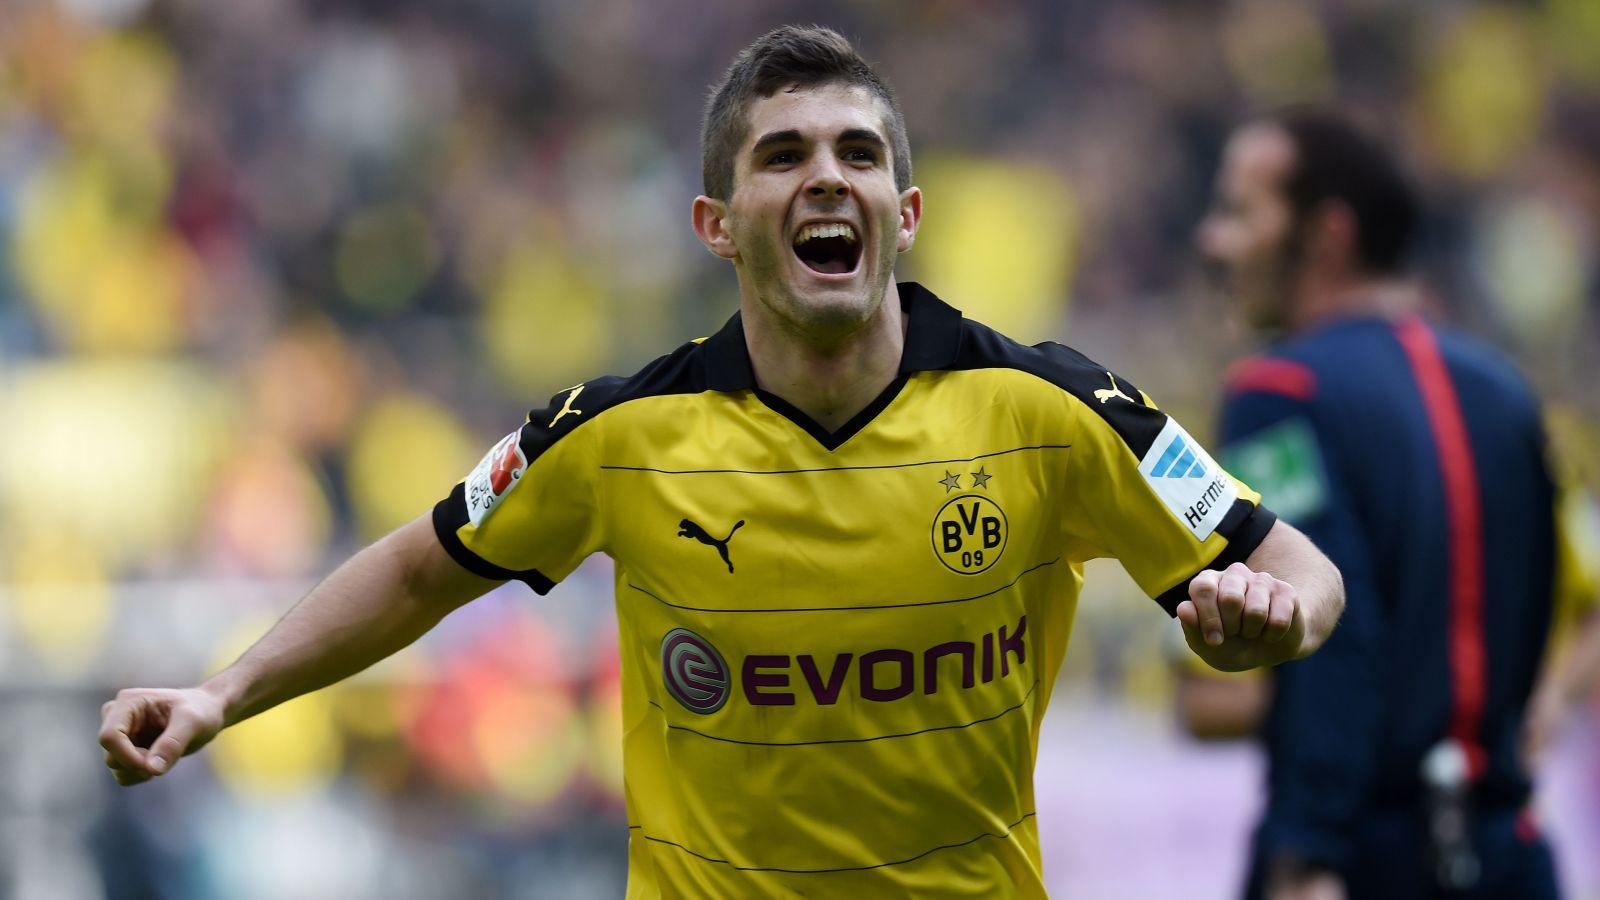 Liverpool boss Klopp to monitor Dortmund midfielder Pulisic